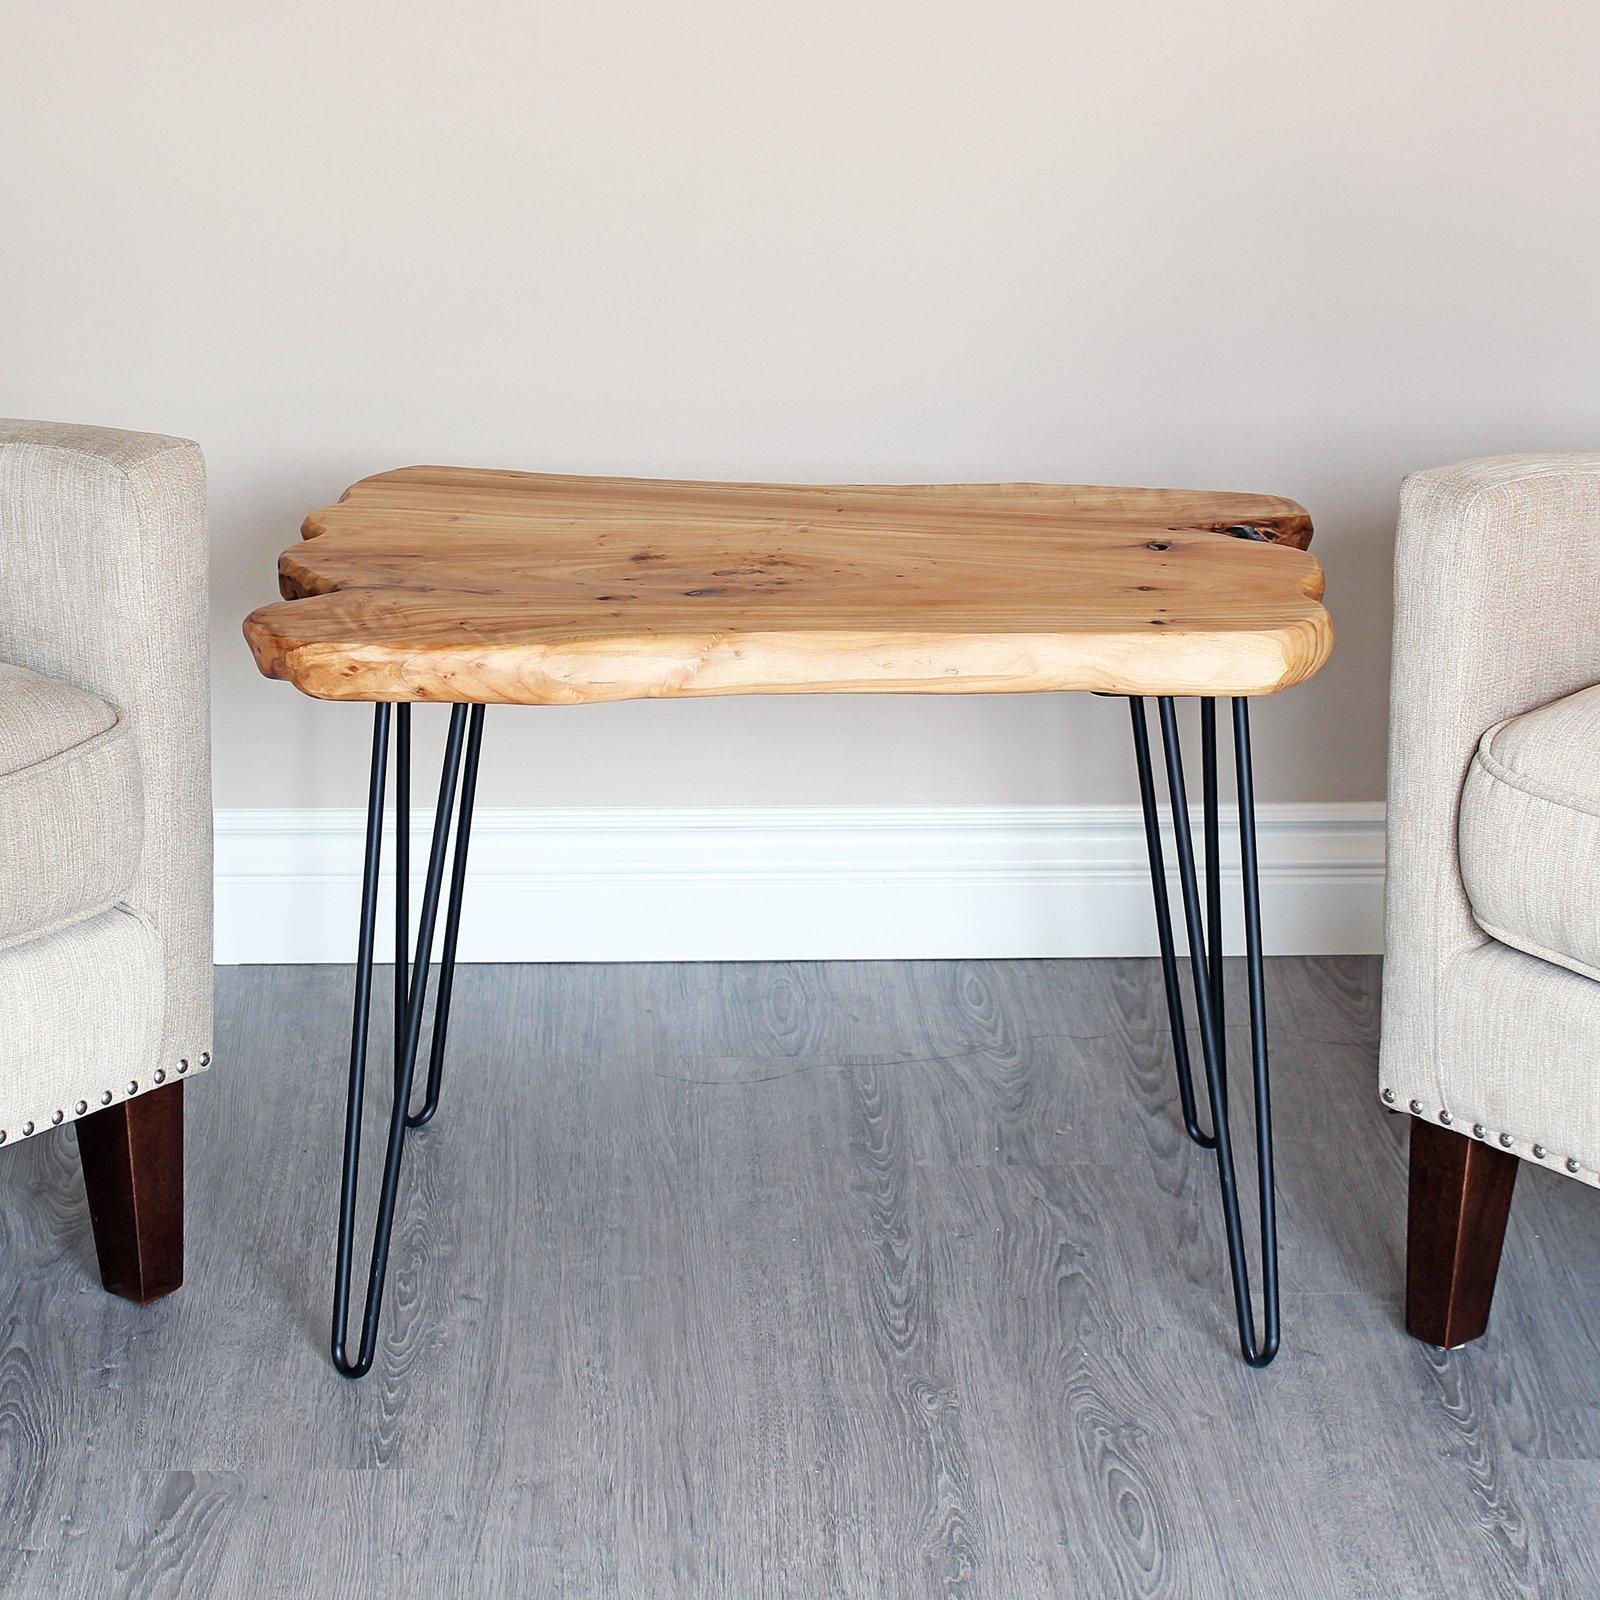 WELLAND Cedar Live Edge Hairpin Coffee Table 28'' L x 20'' W x 20.5'' T by WELLAND (Image #3)